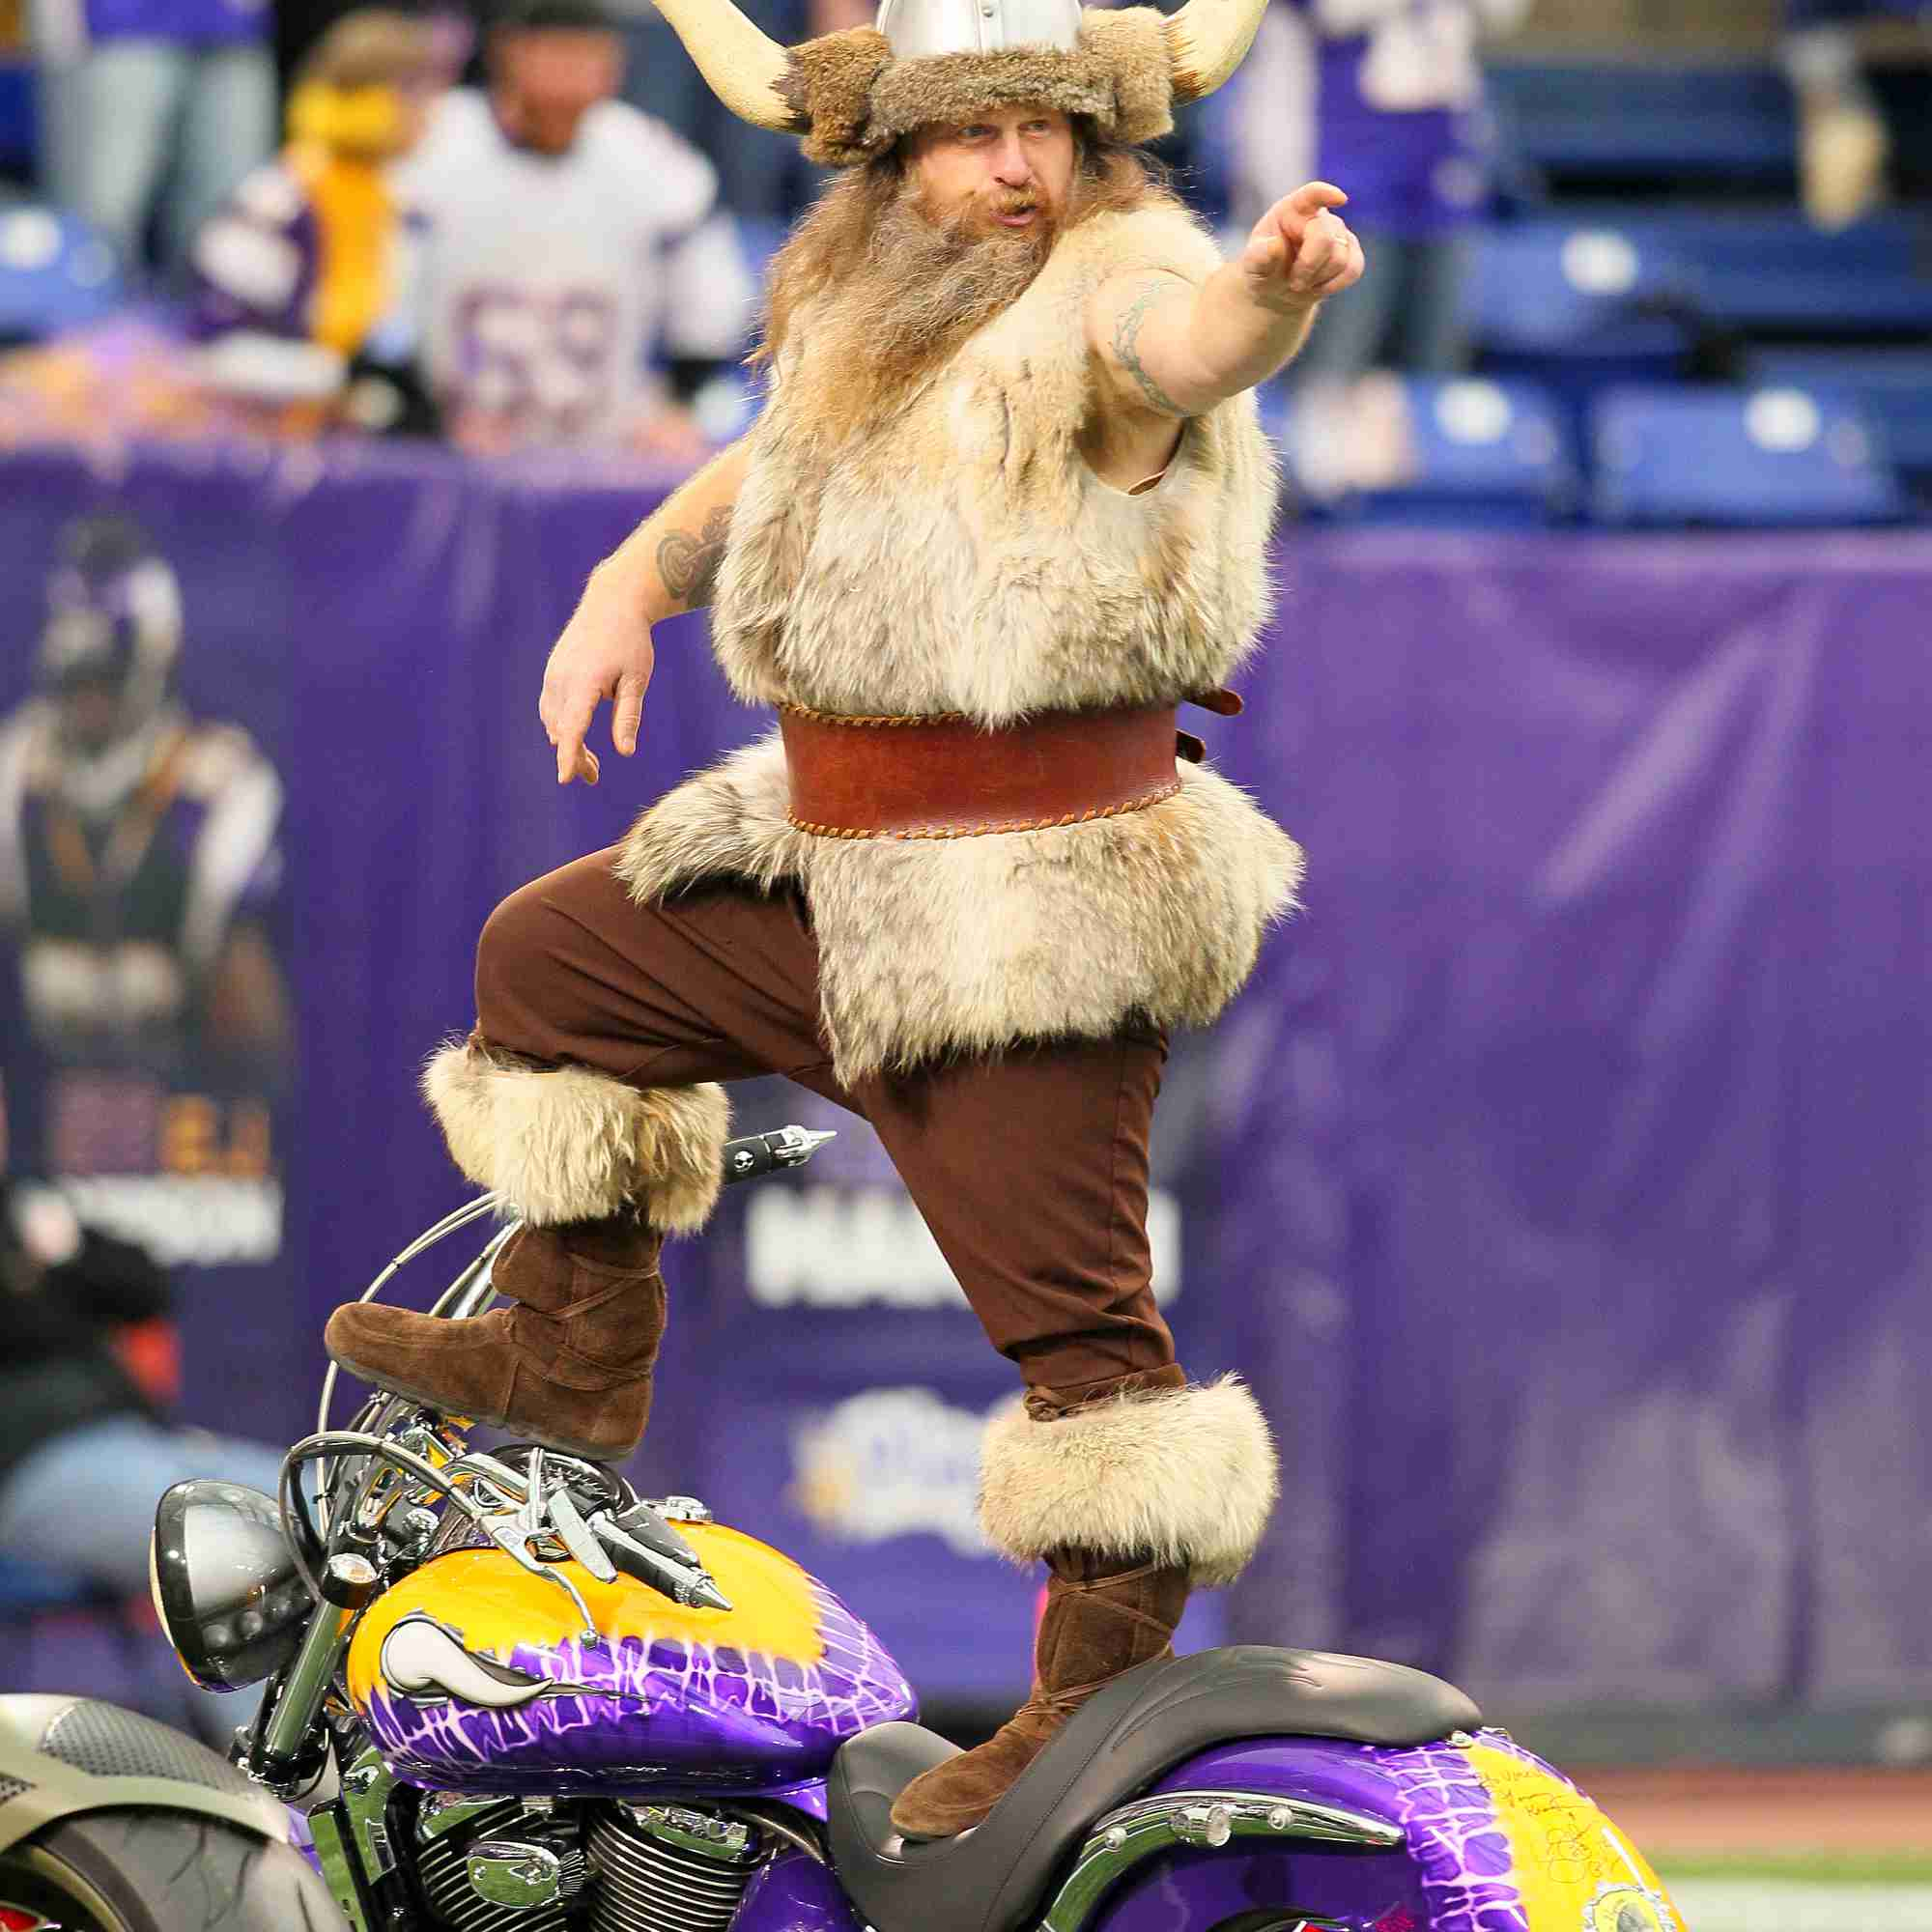 Minnesota Vikings mascot Ragnar